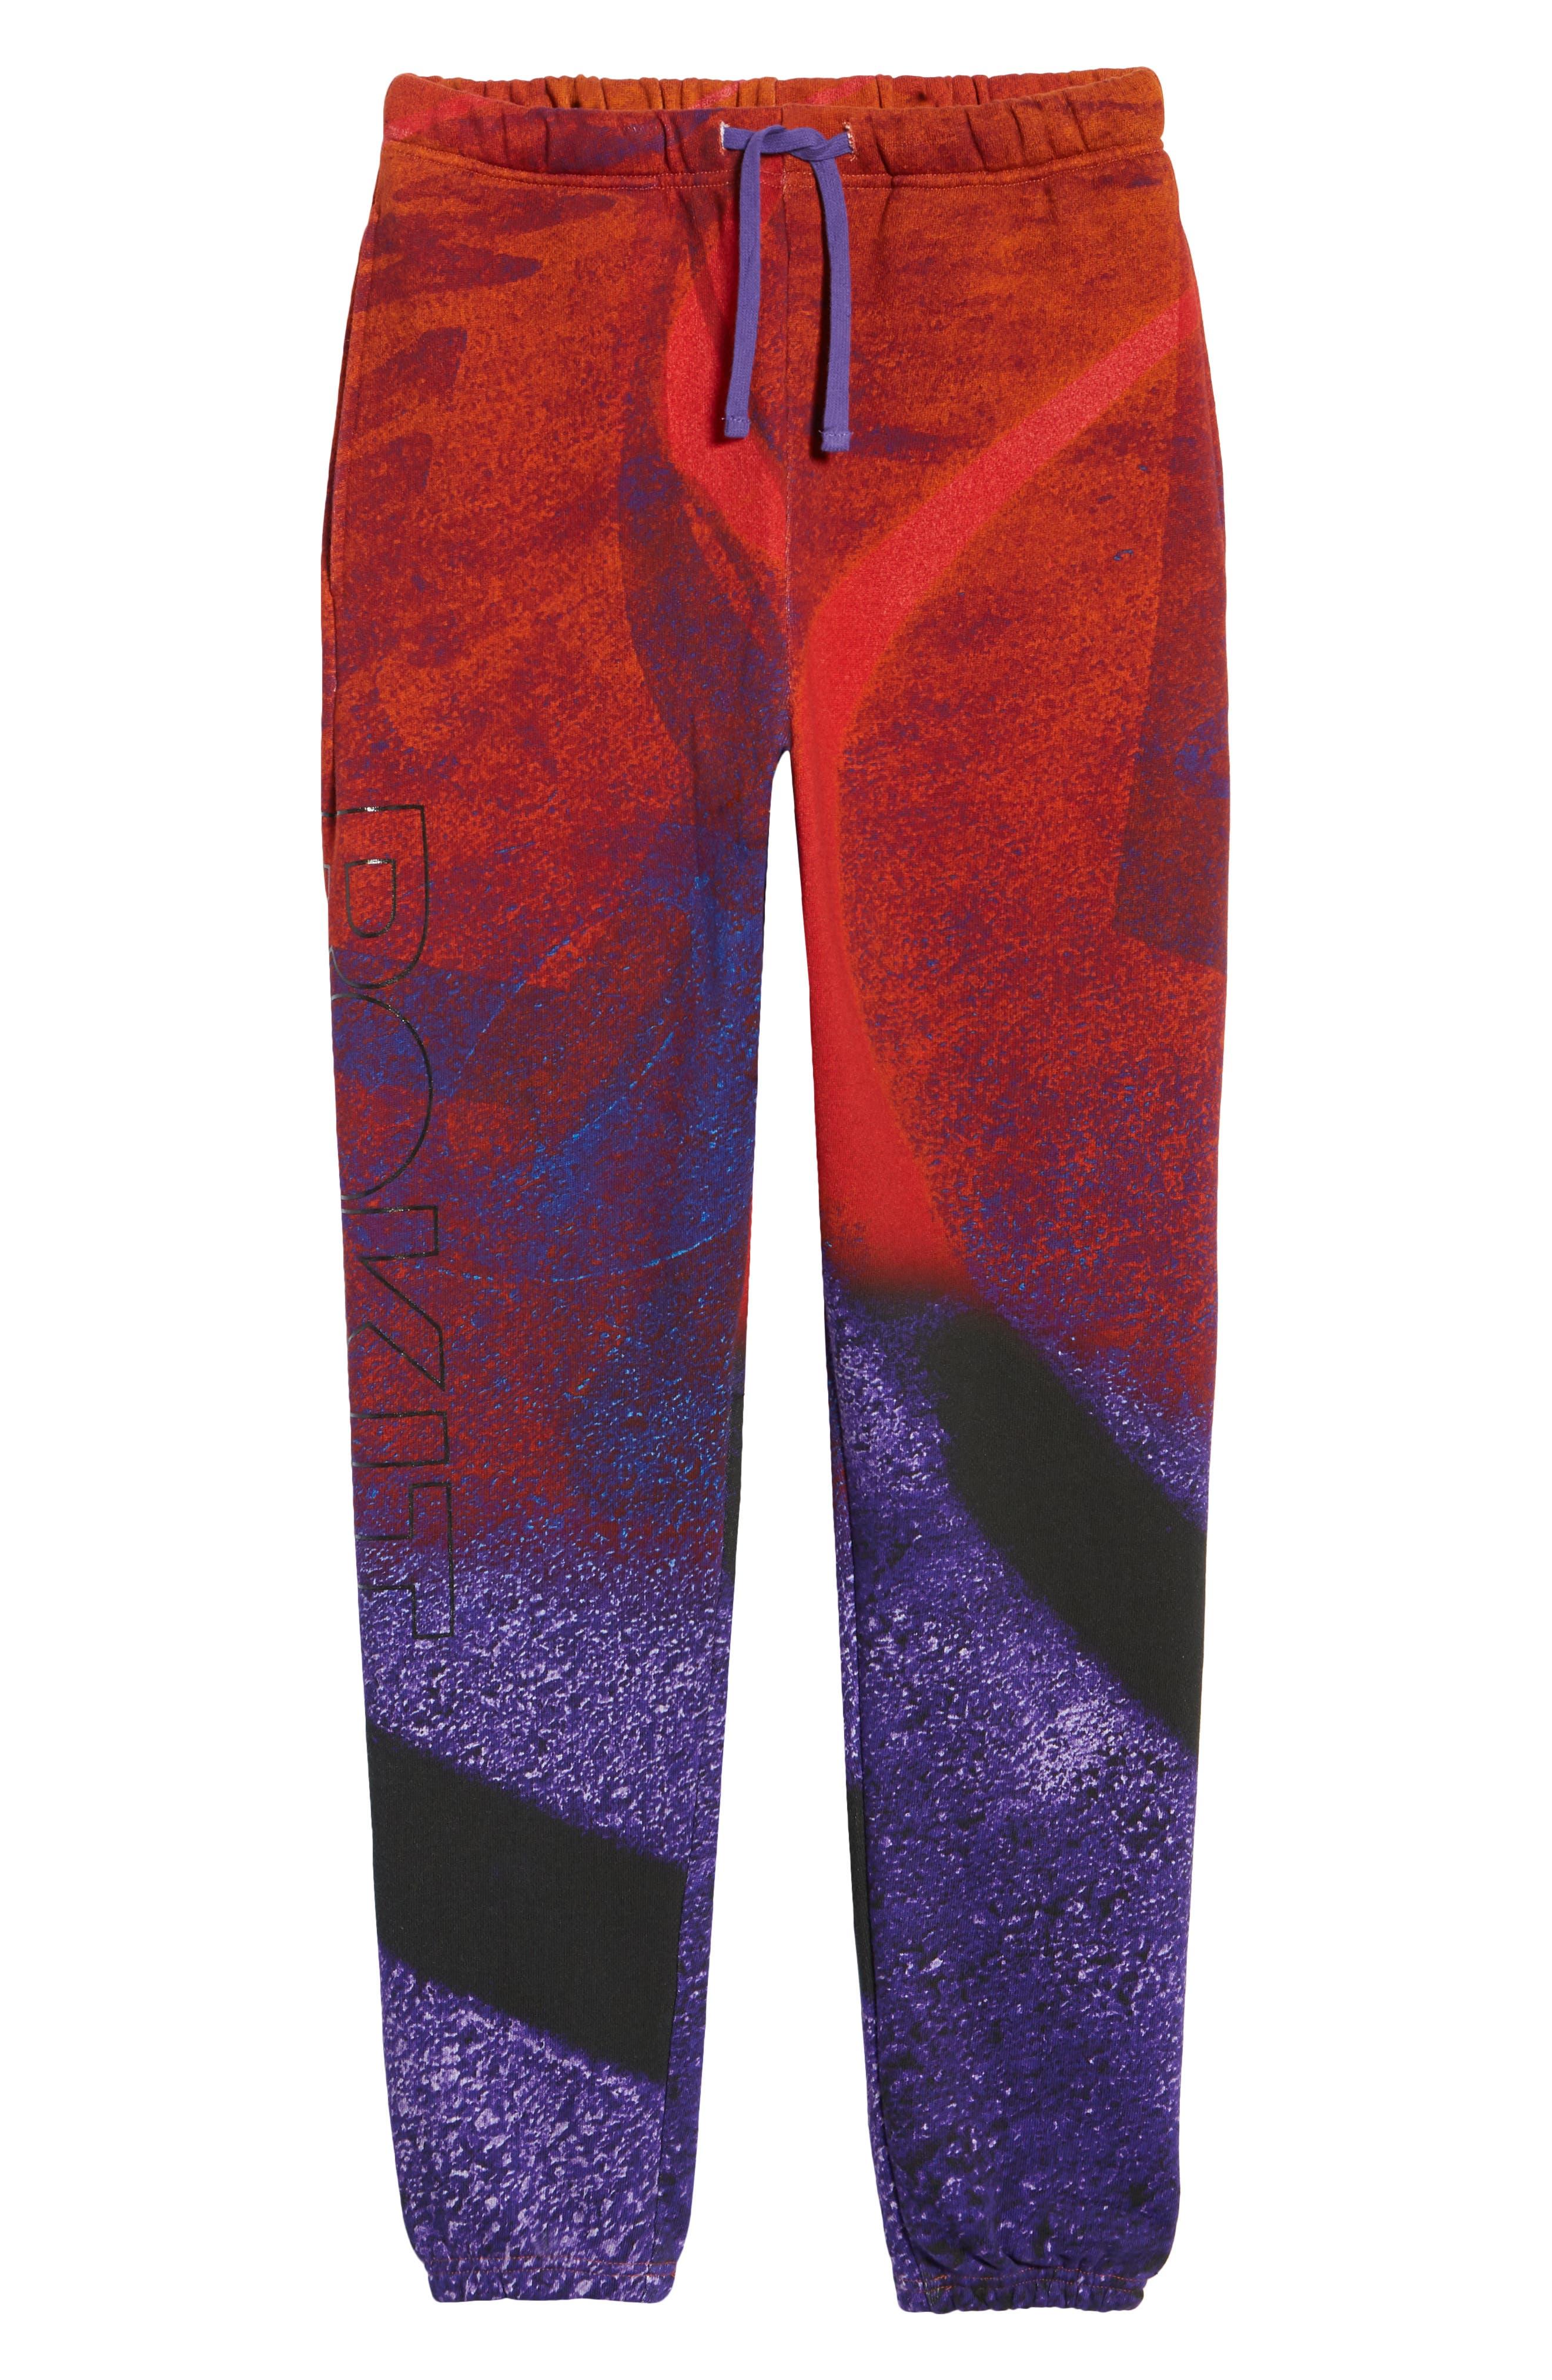 Men's Rokit Men's Blacktop Sweatpants